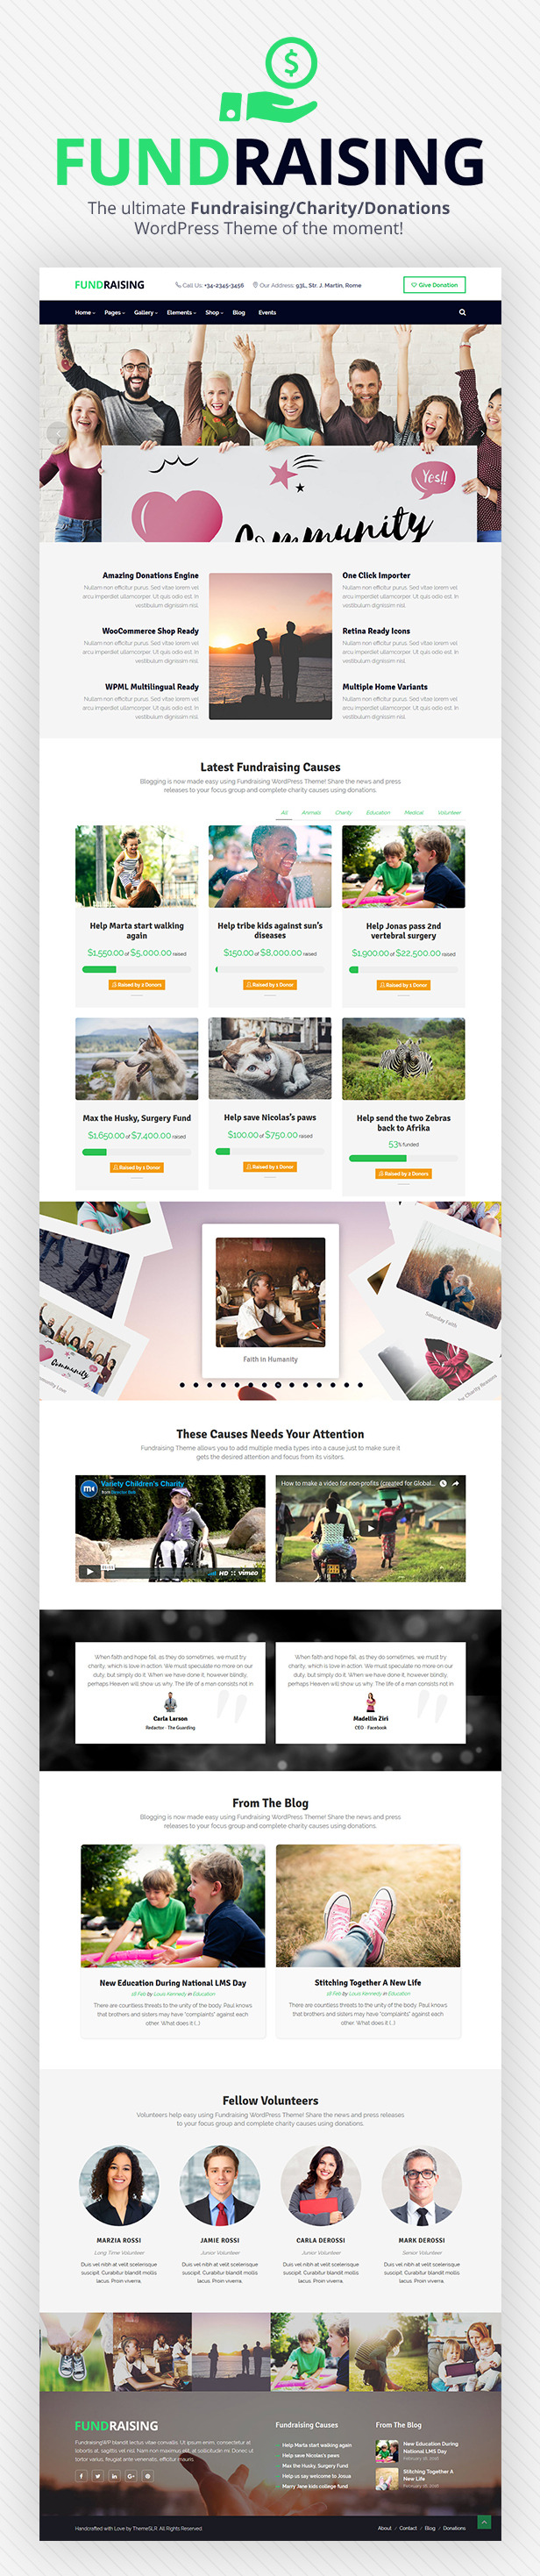 Fundraising - Charity/Donations WordPress Theme - 3